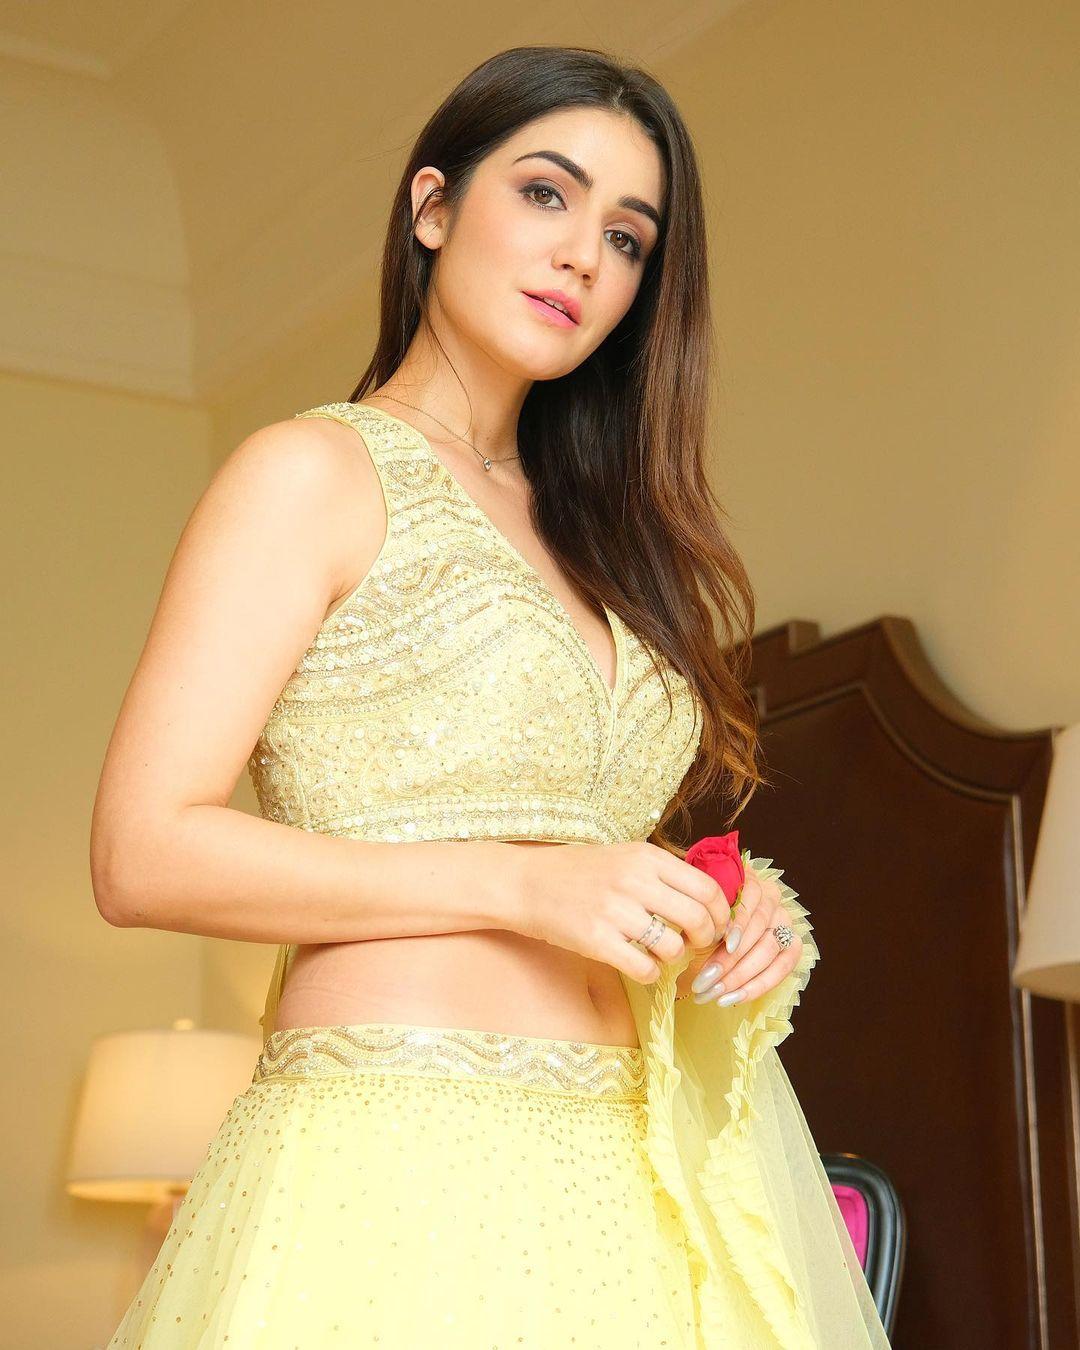 Amy Aela - Beautiful Indian Model Wallpapers DP